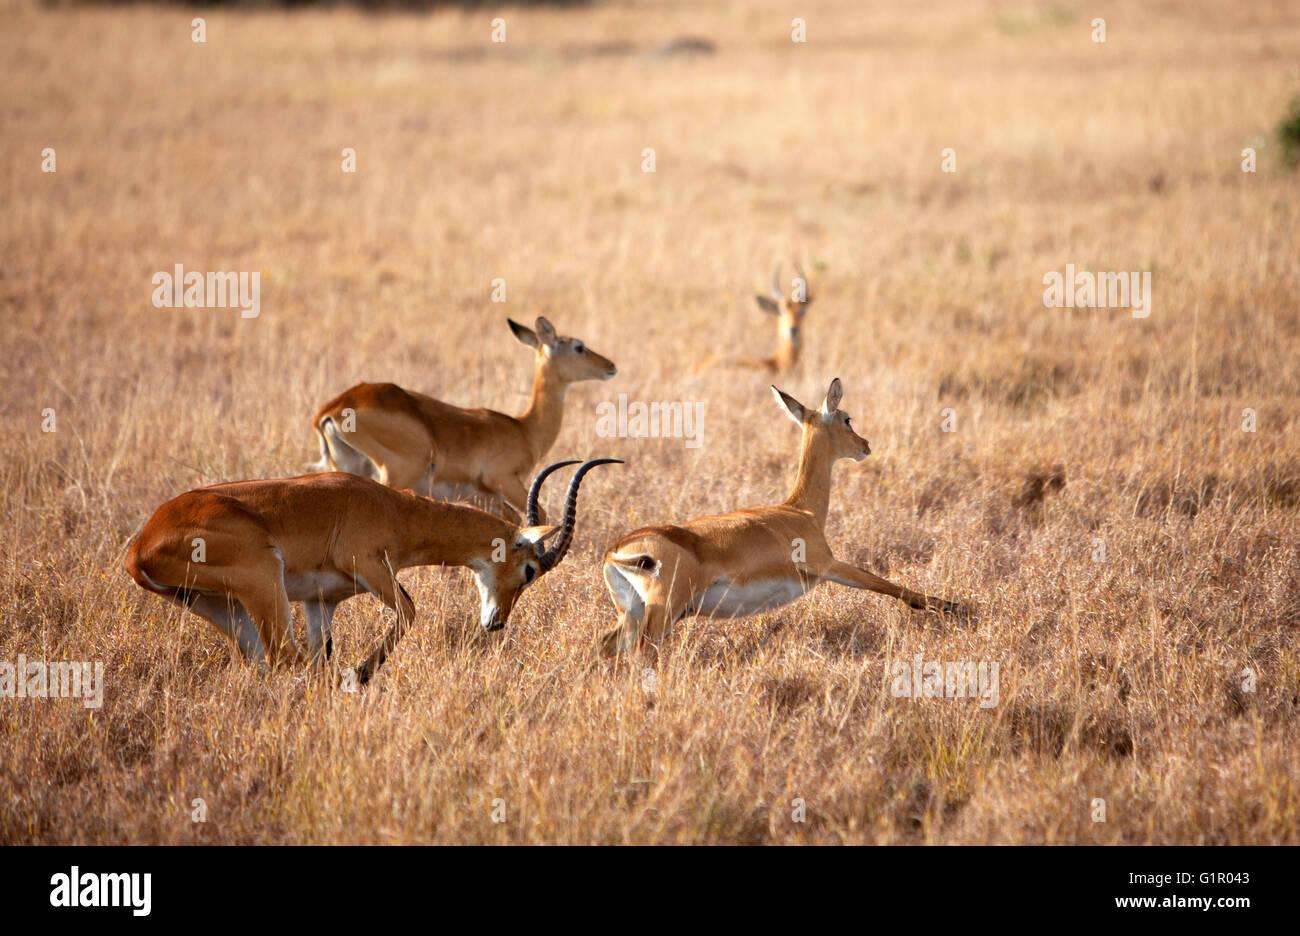 Photograph by © Jamie Callister. Ugandan Kob grazing in Queen Elizabeth National Park, Uganda, Central Africa, - Stock Image